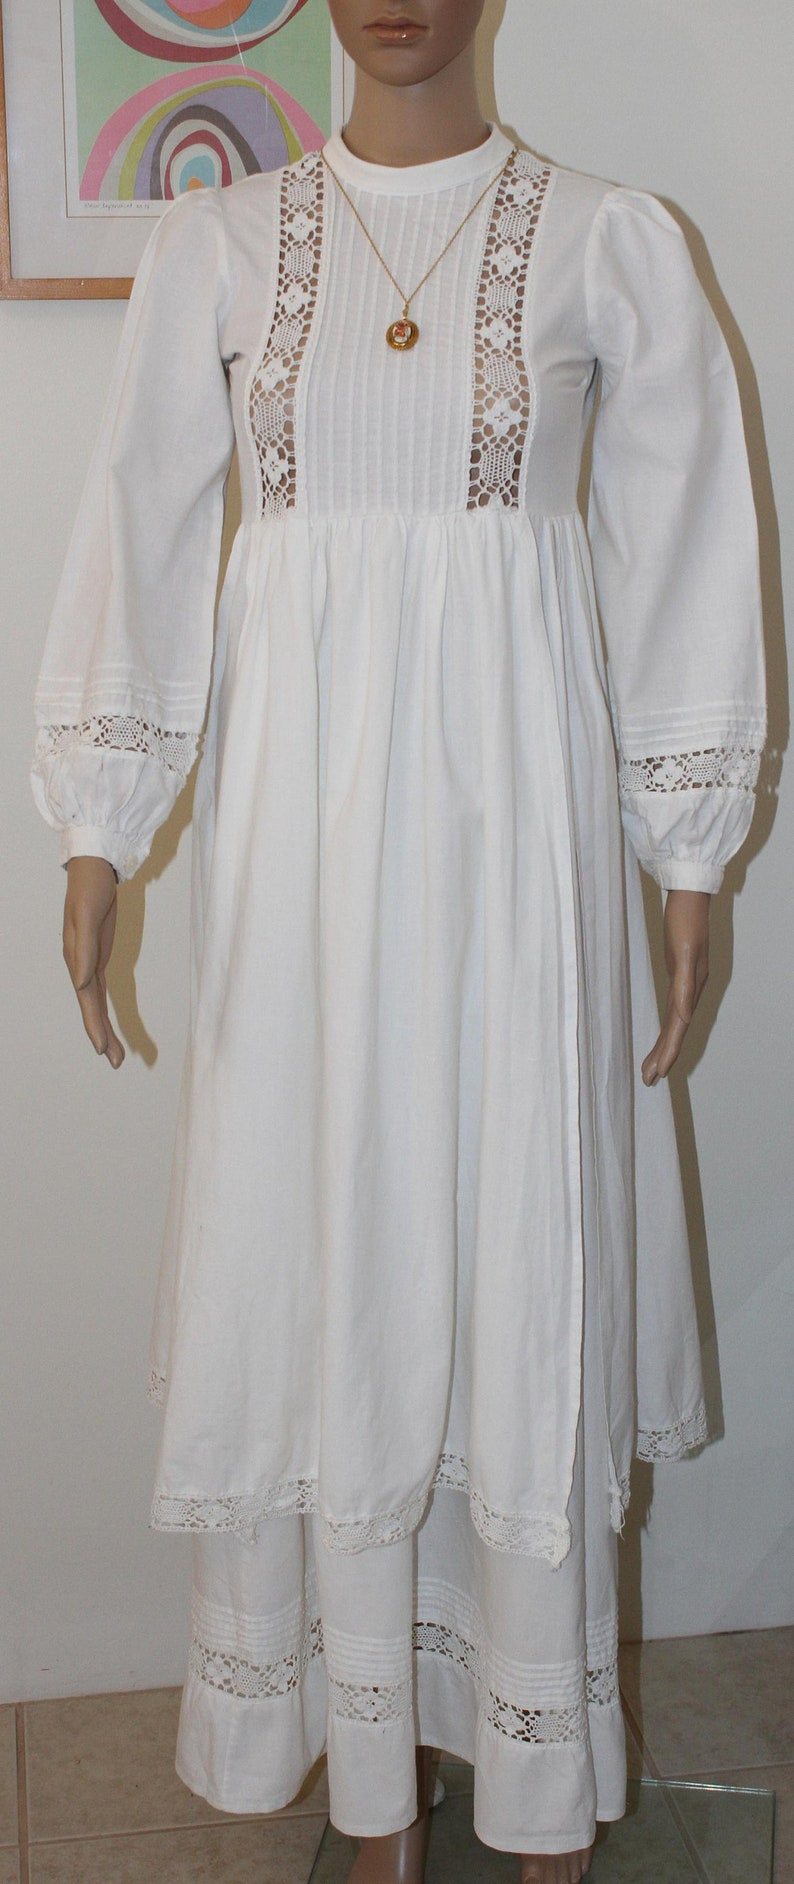 Vintage Laura Ashley Victorian Crochet Trim Pintucked Wedding Gown Bride Dress